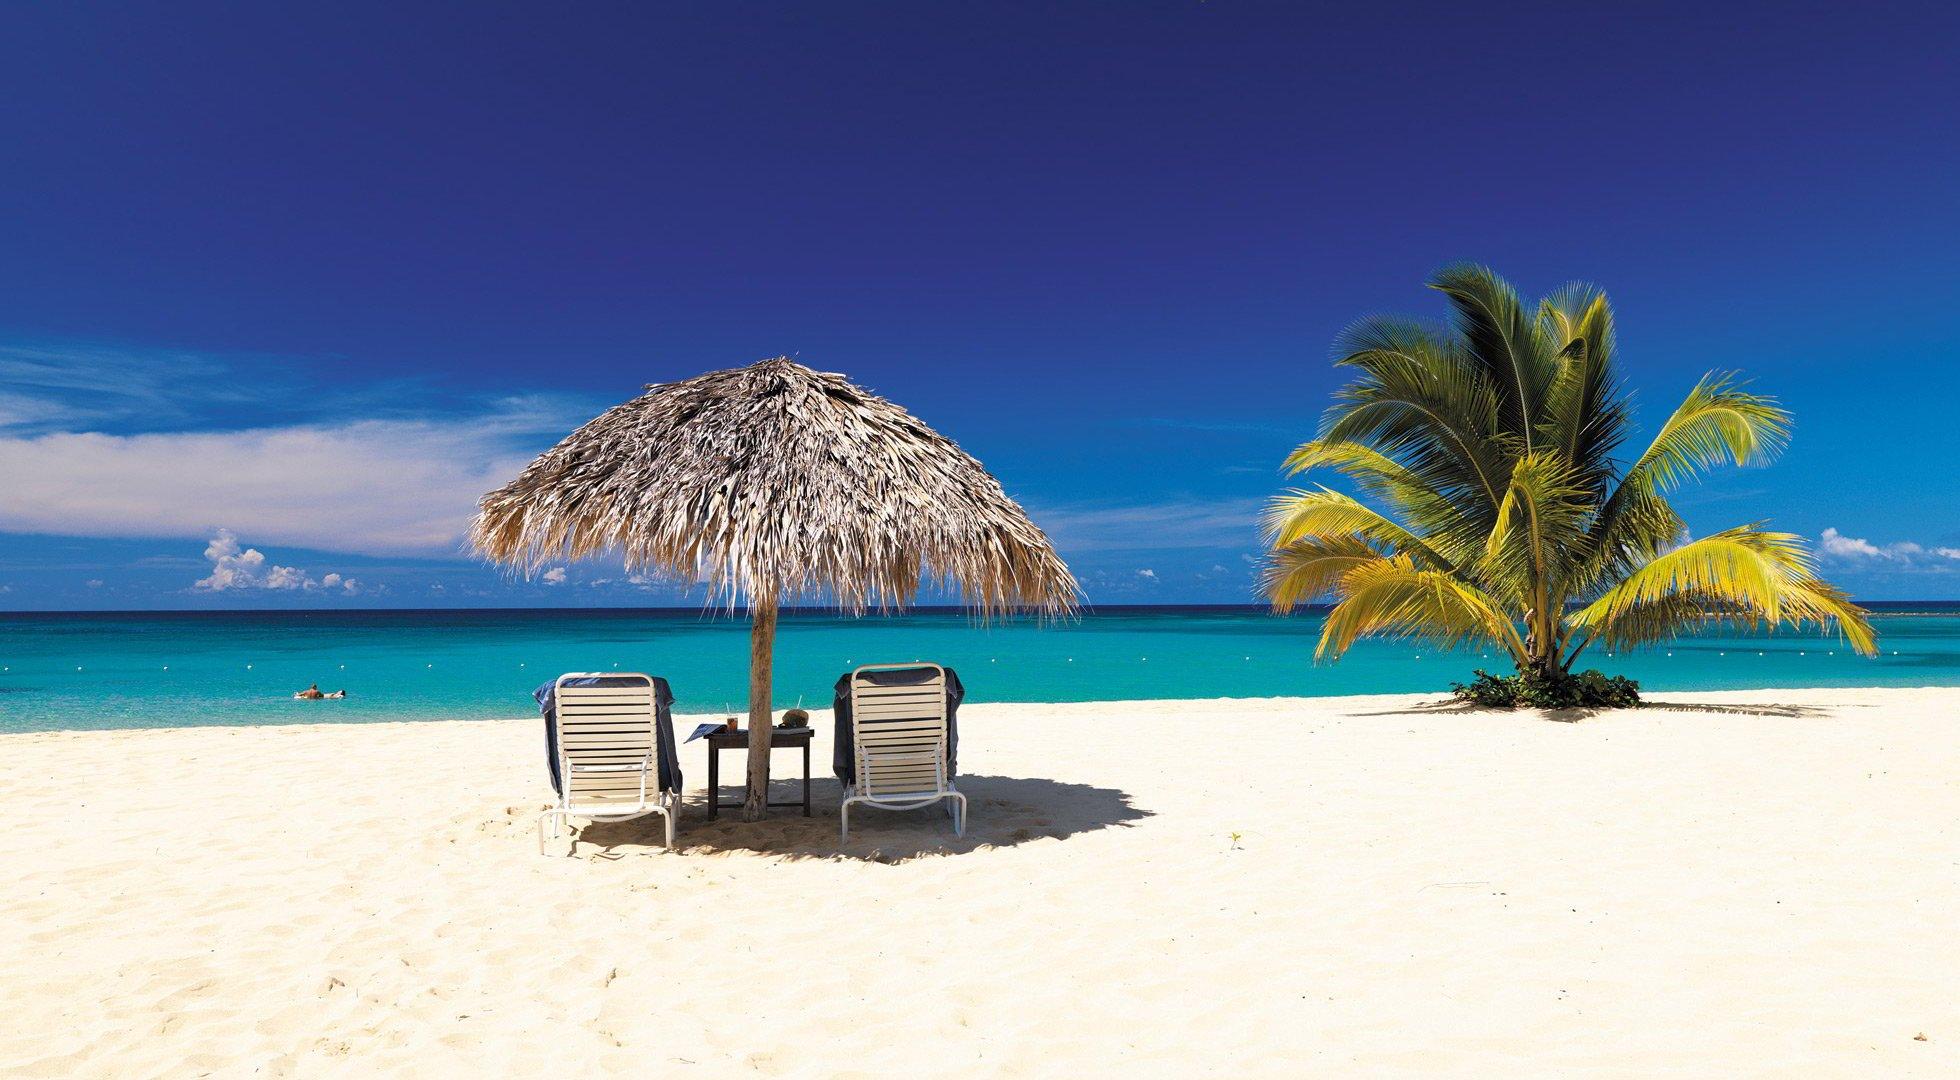 Photo Credit http://jamaicainn.com/resort/beach.php